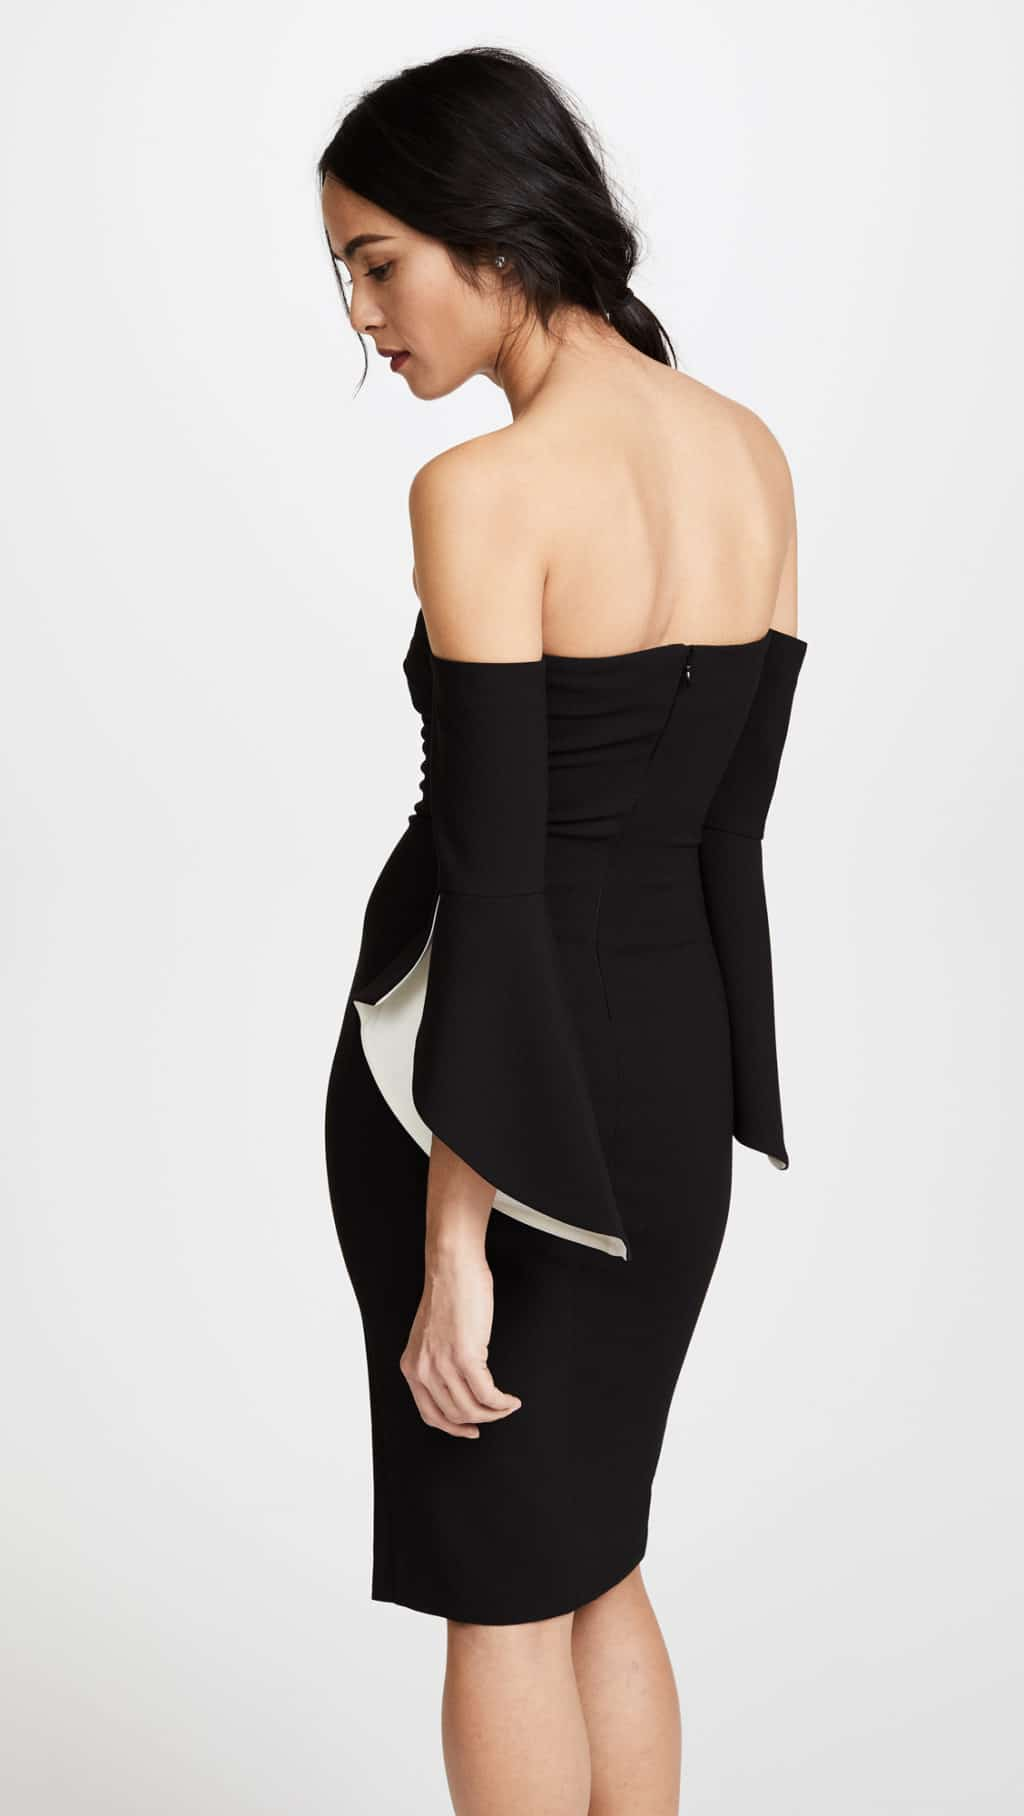 LIKELY Ramona Black   White Dress - We Select Dresses f584e33ac9bd